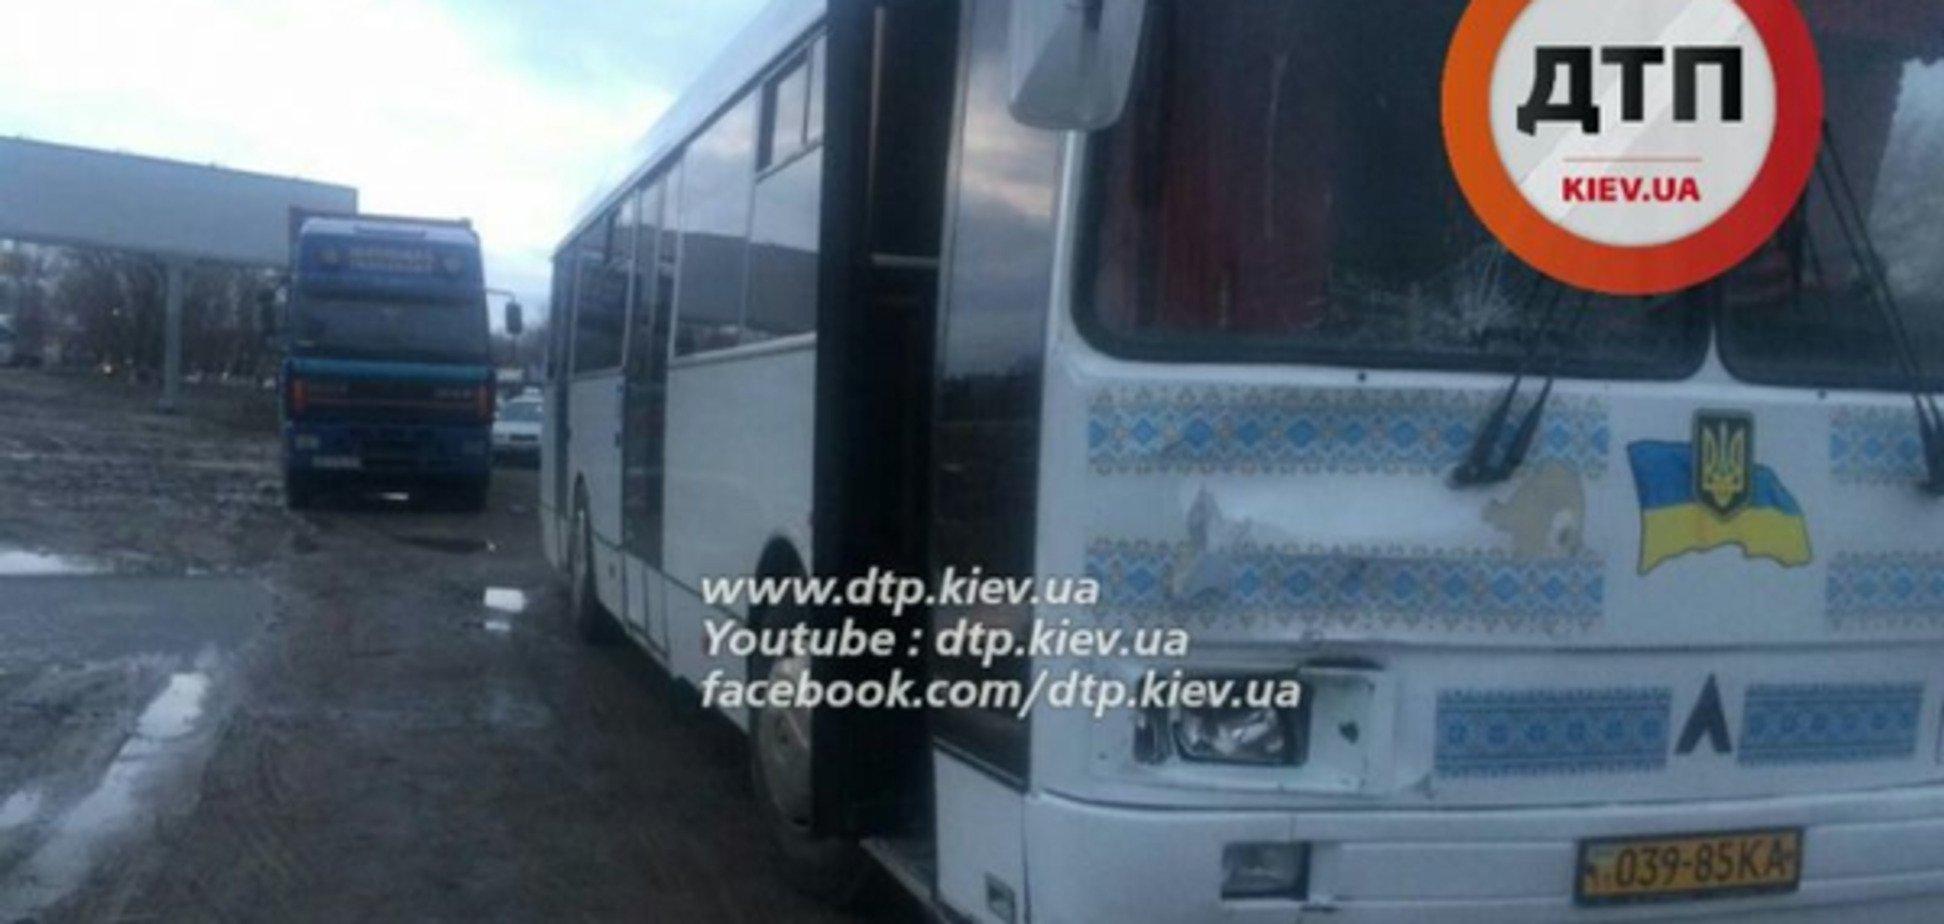 У Києві автобус збив на смерть пішохода-порушника